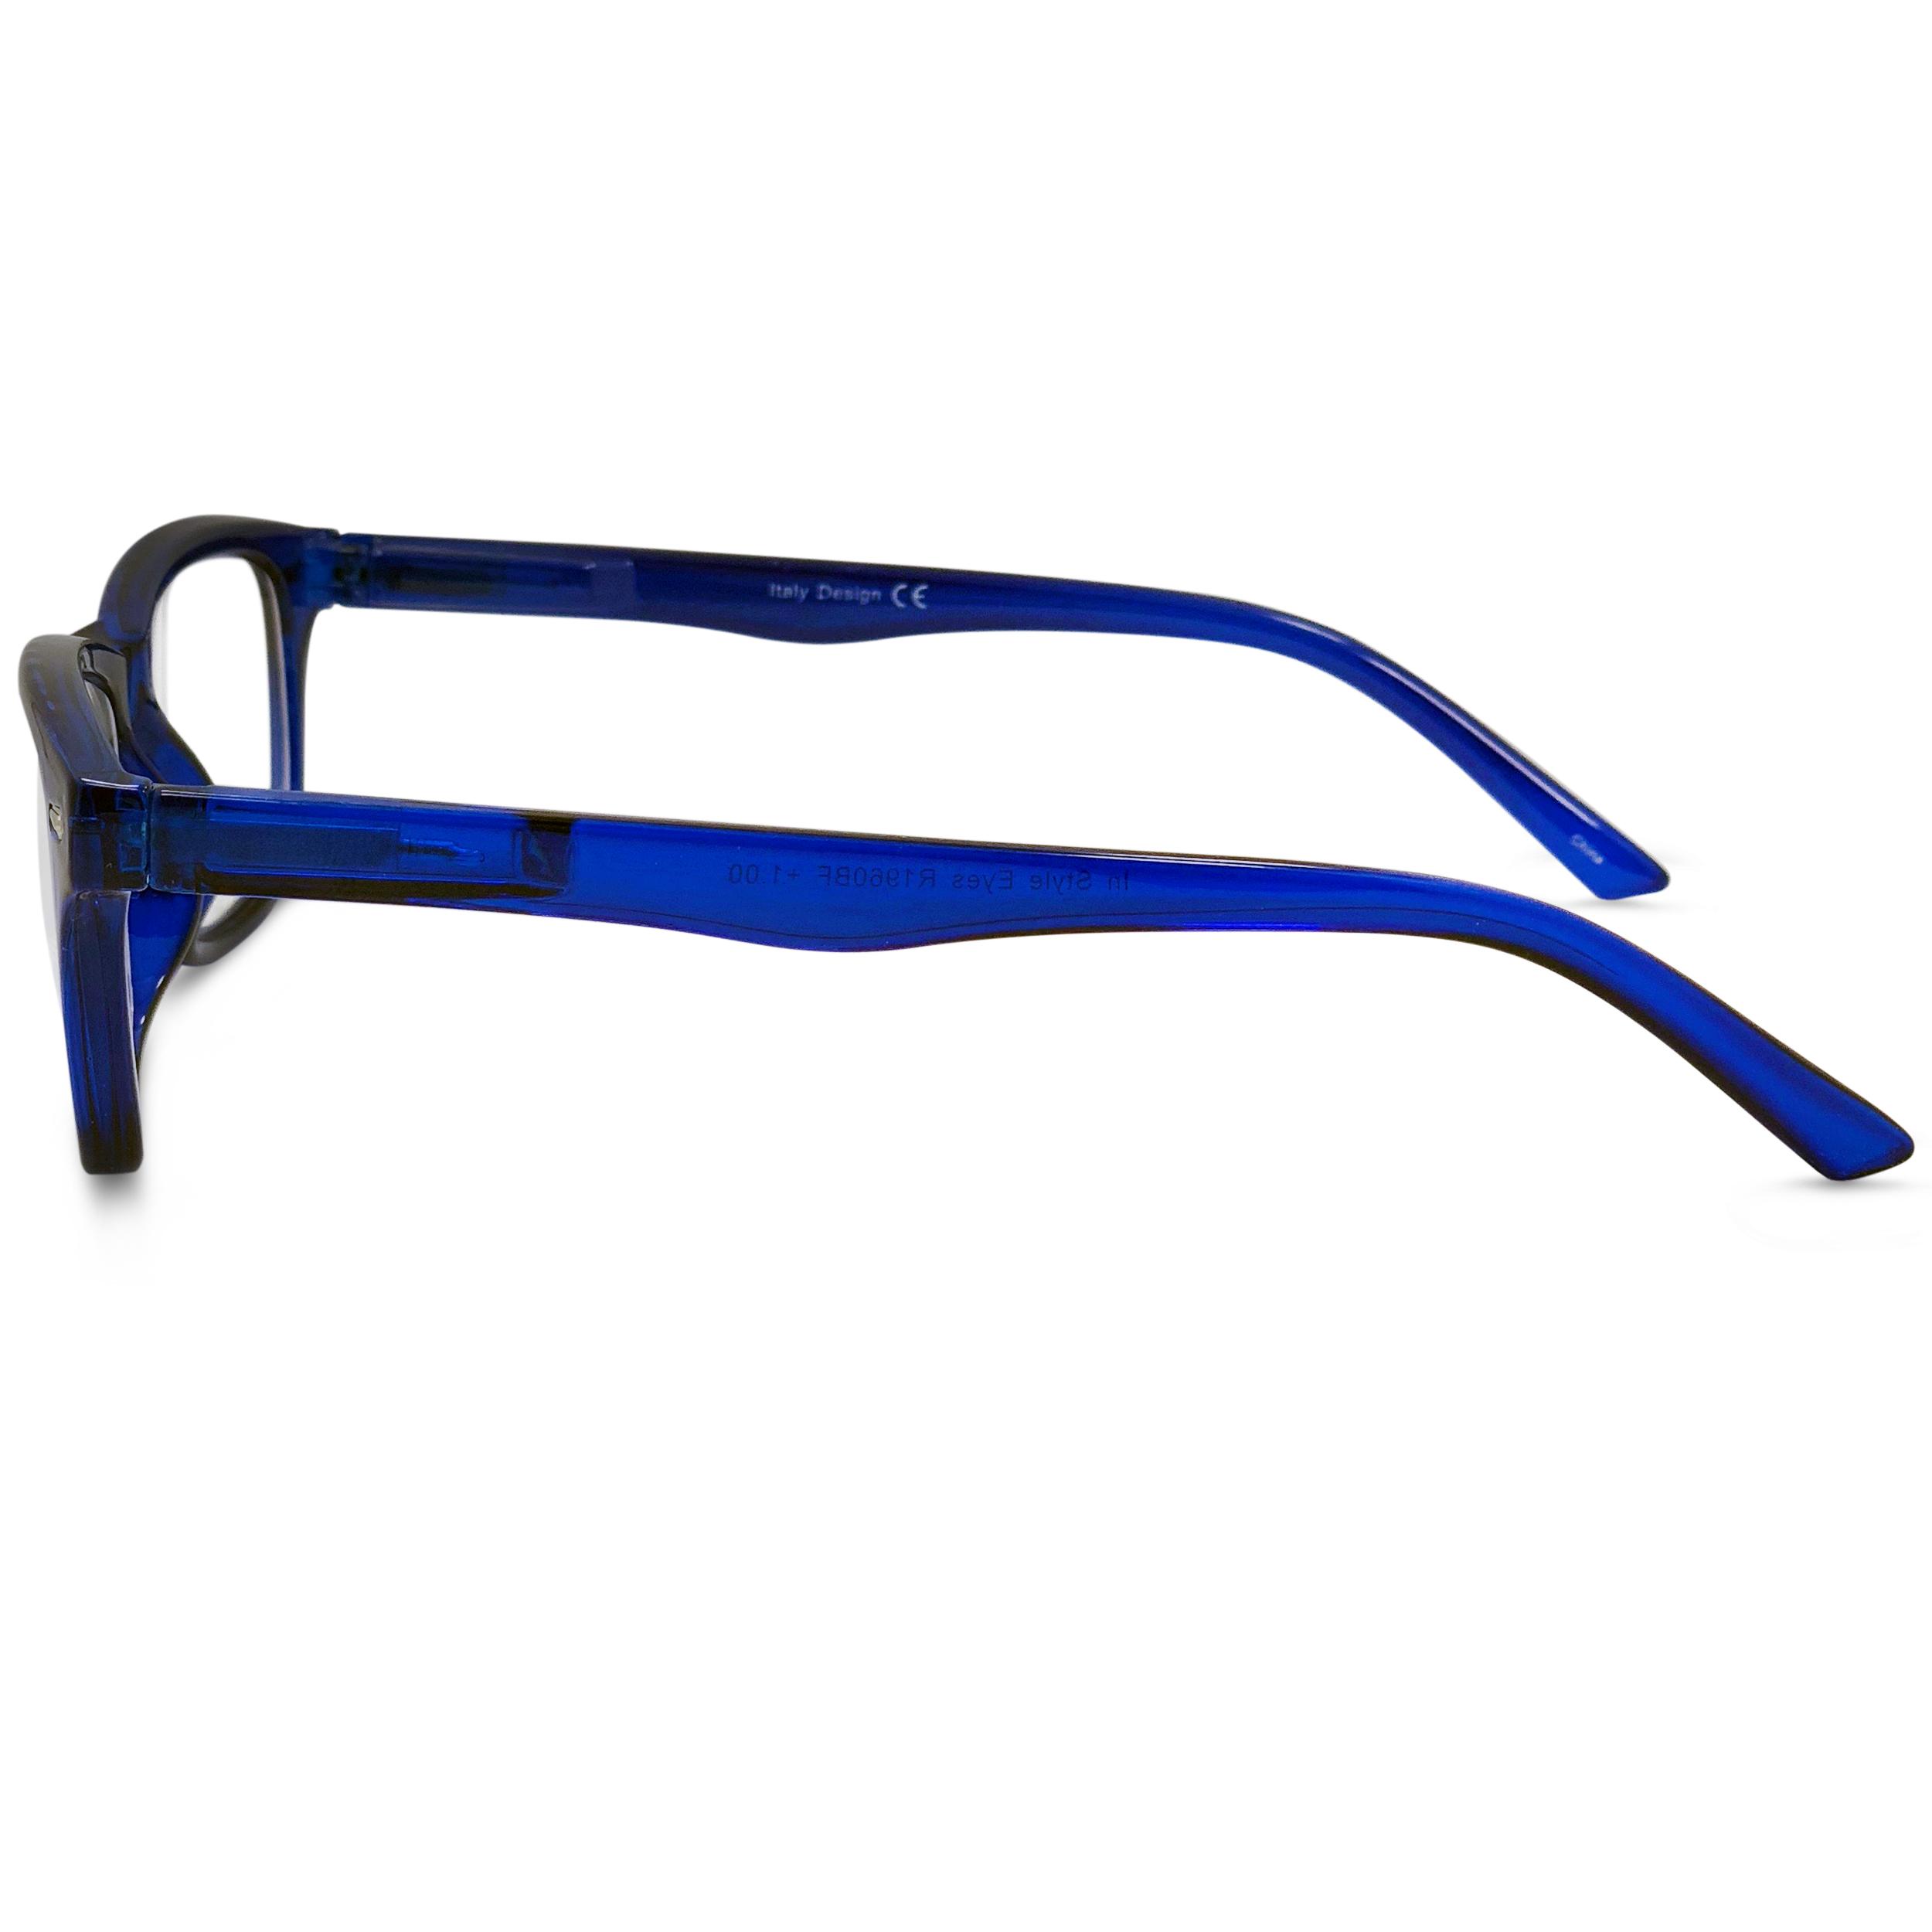 cf8355ca5e3 In-Style-Eyes-Seymore-Retro-BiFocal-Reading-Glasses thumbnail